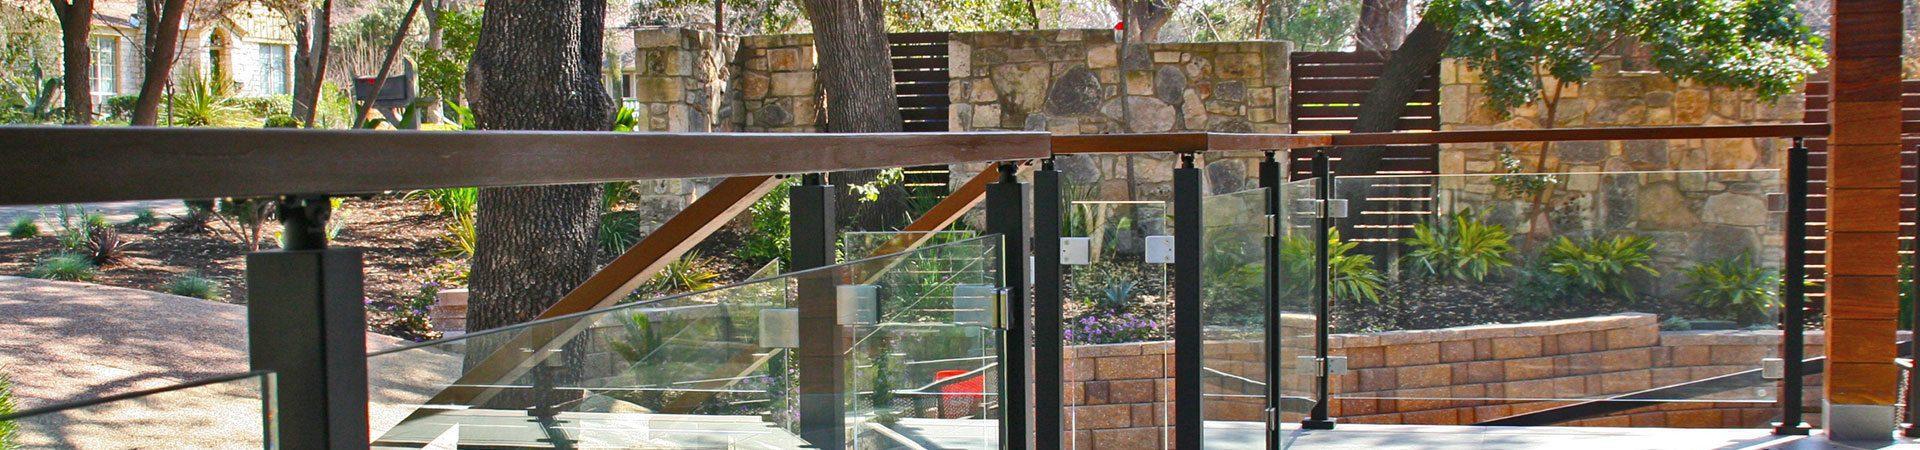 Glass Handrails | Maximum Safety with Minimum Materials | Anchor-Ventana Glass Company